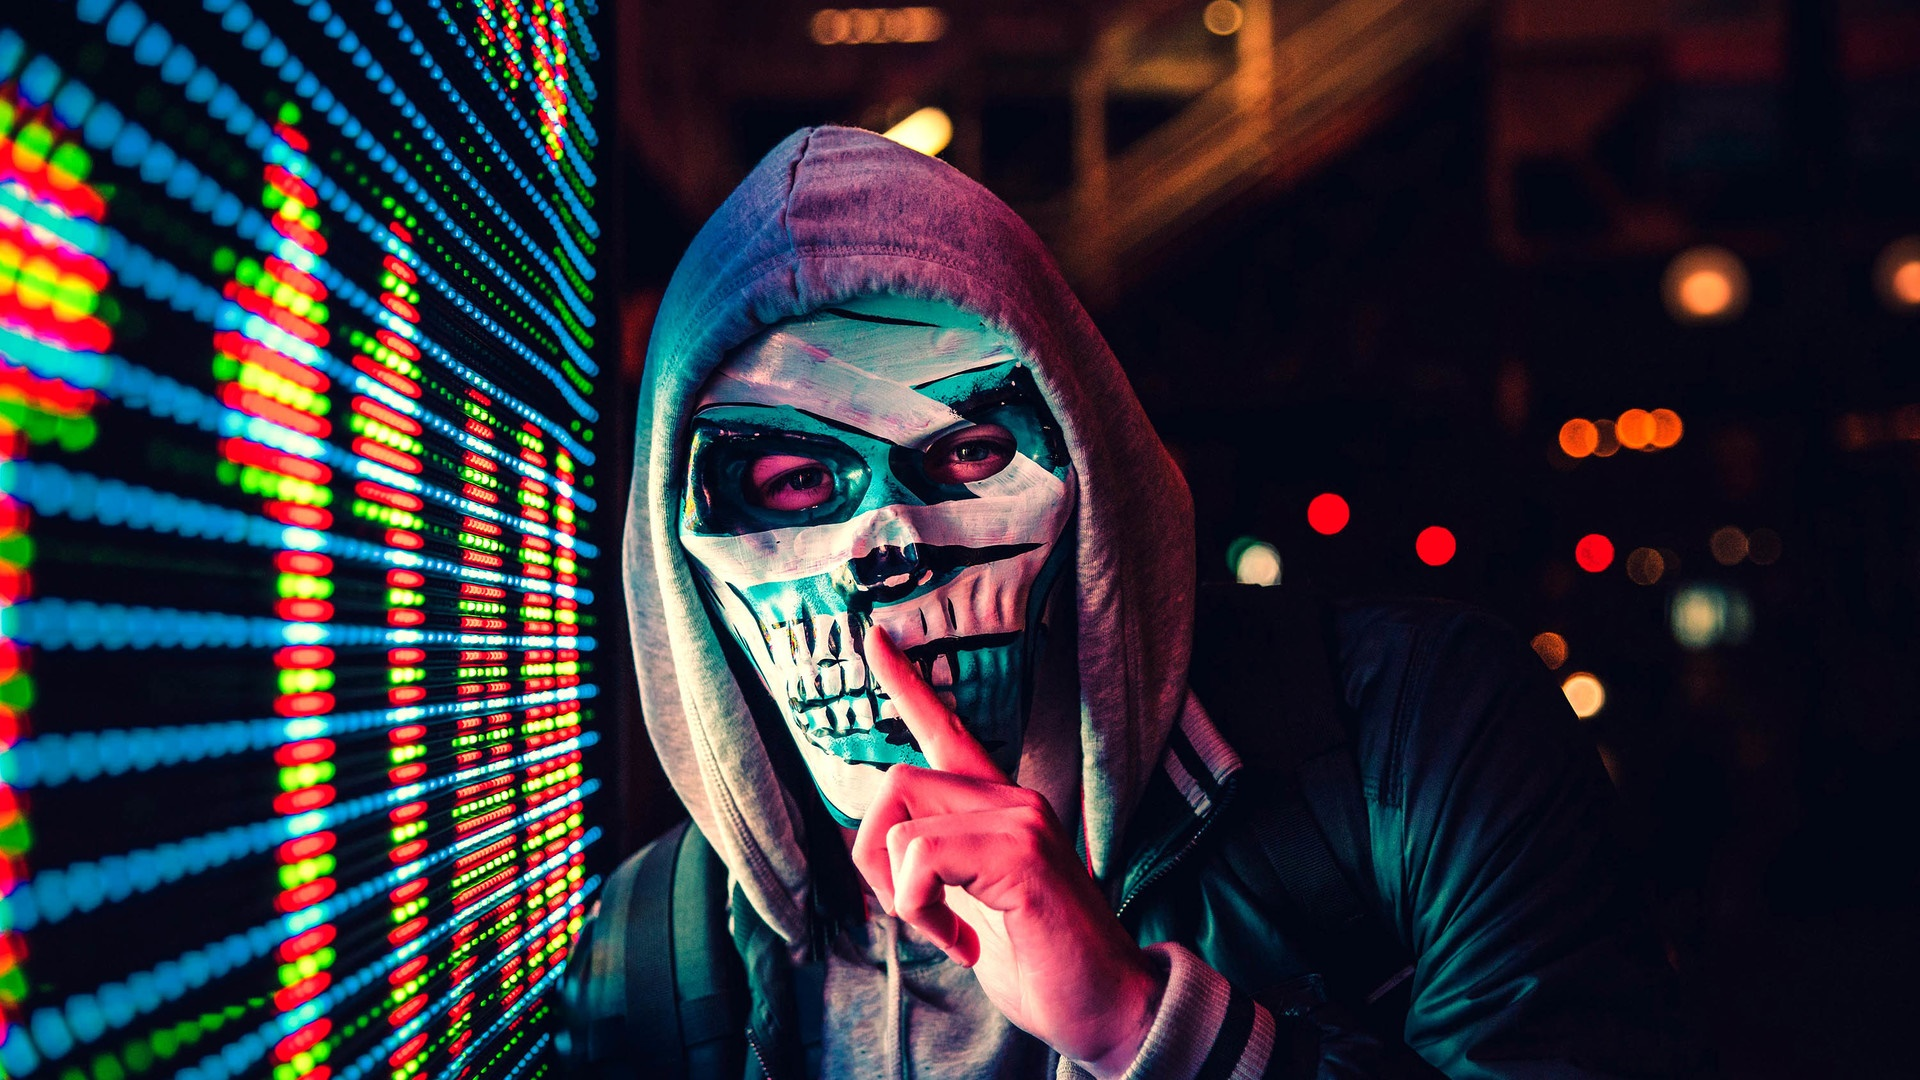 skullfull mask boy wallpaper - backiee